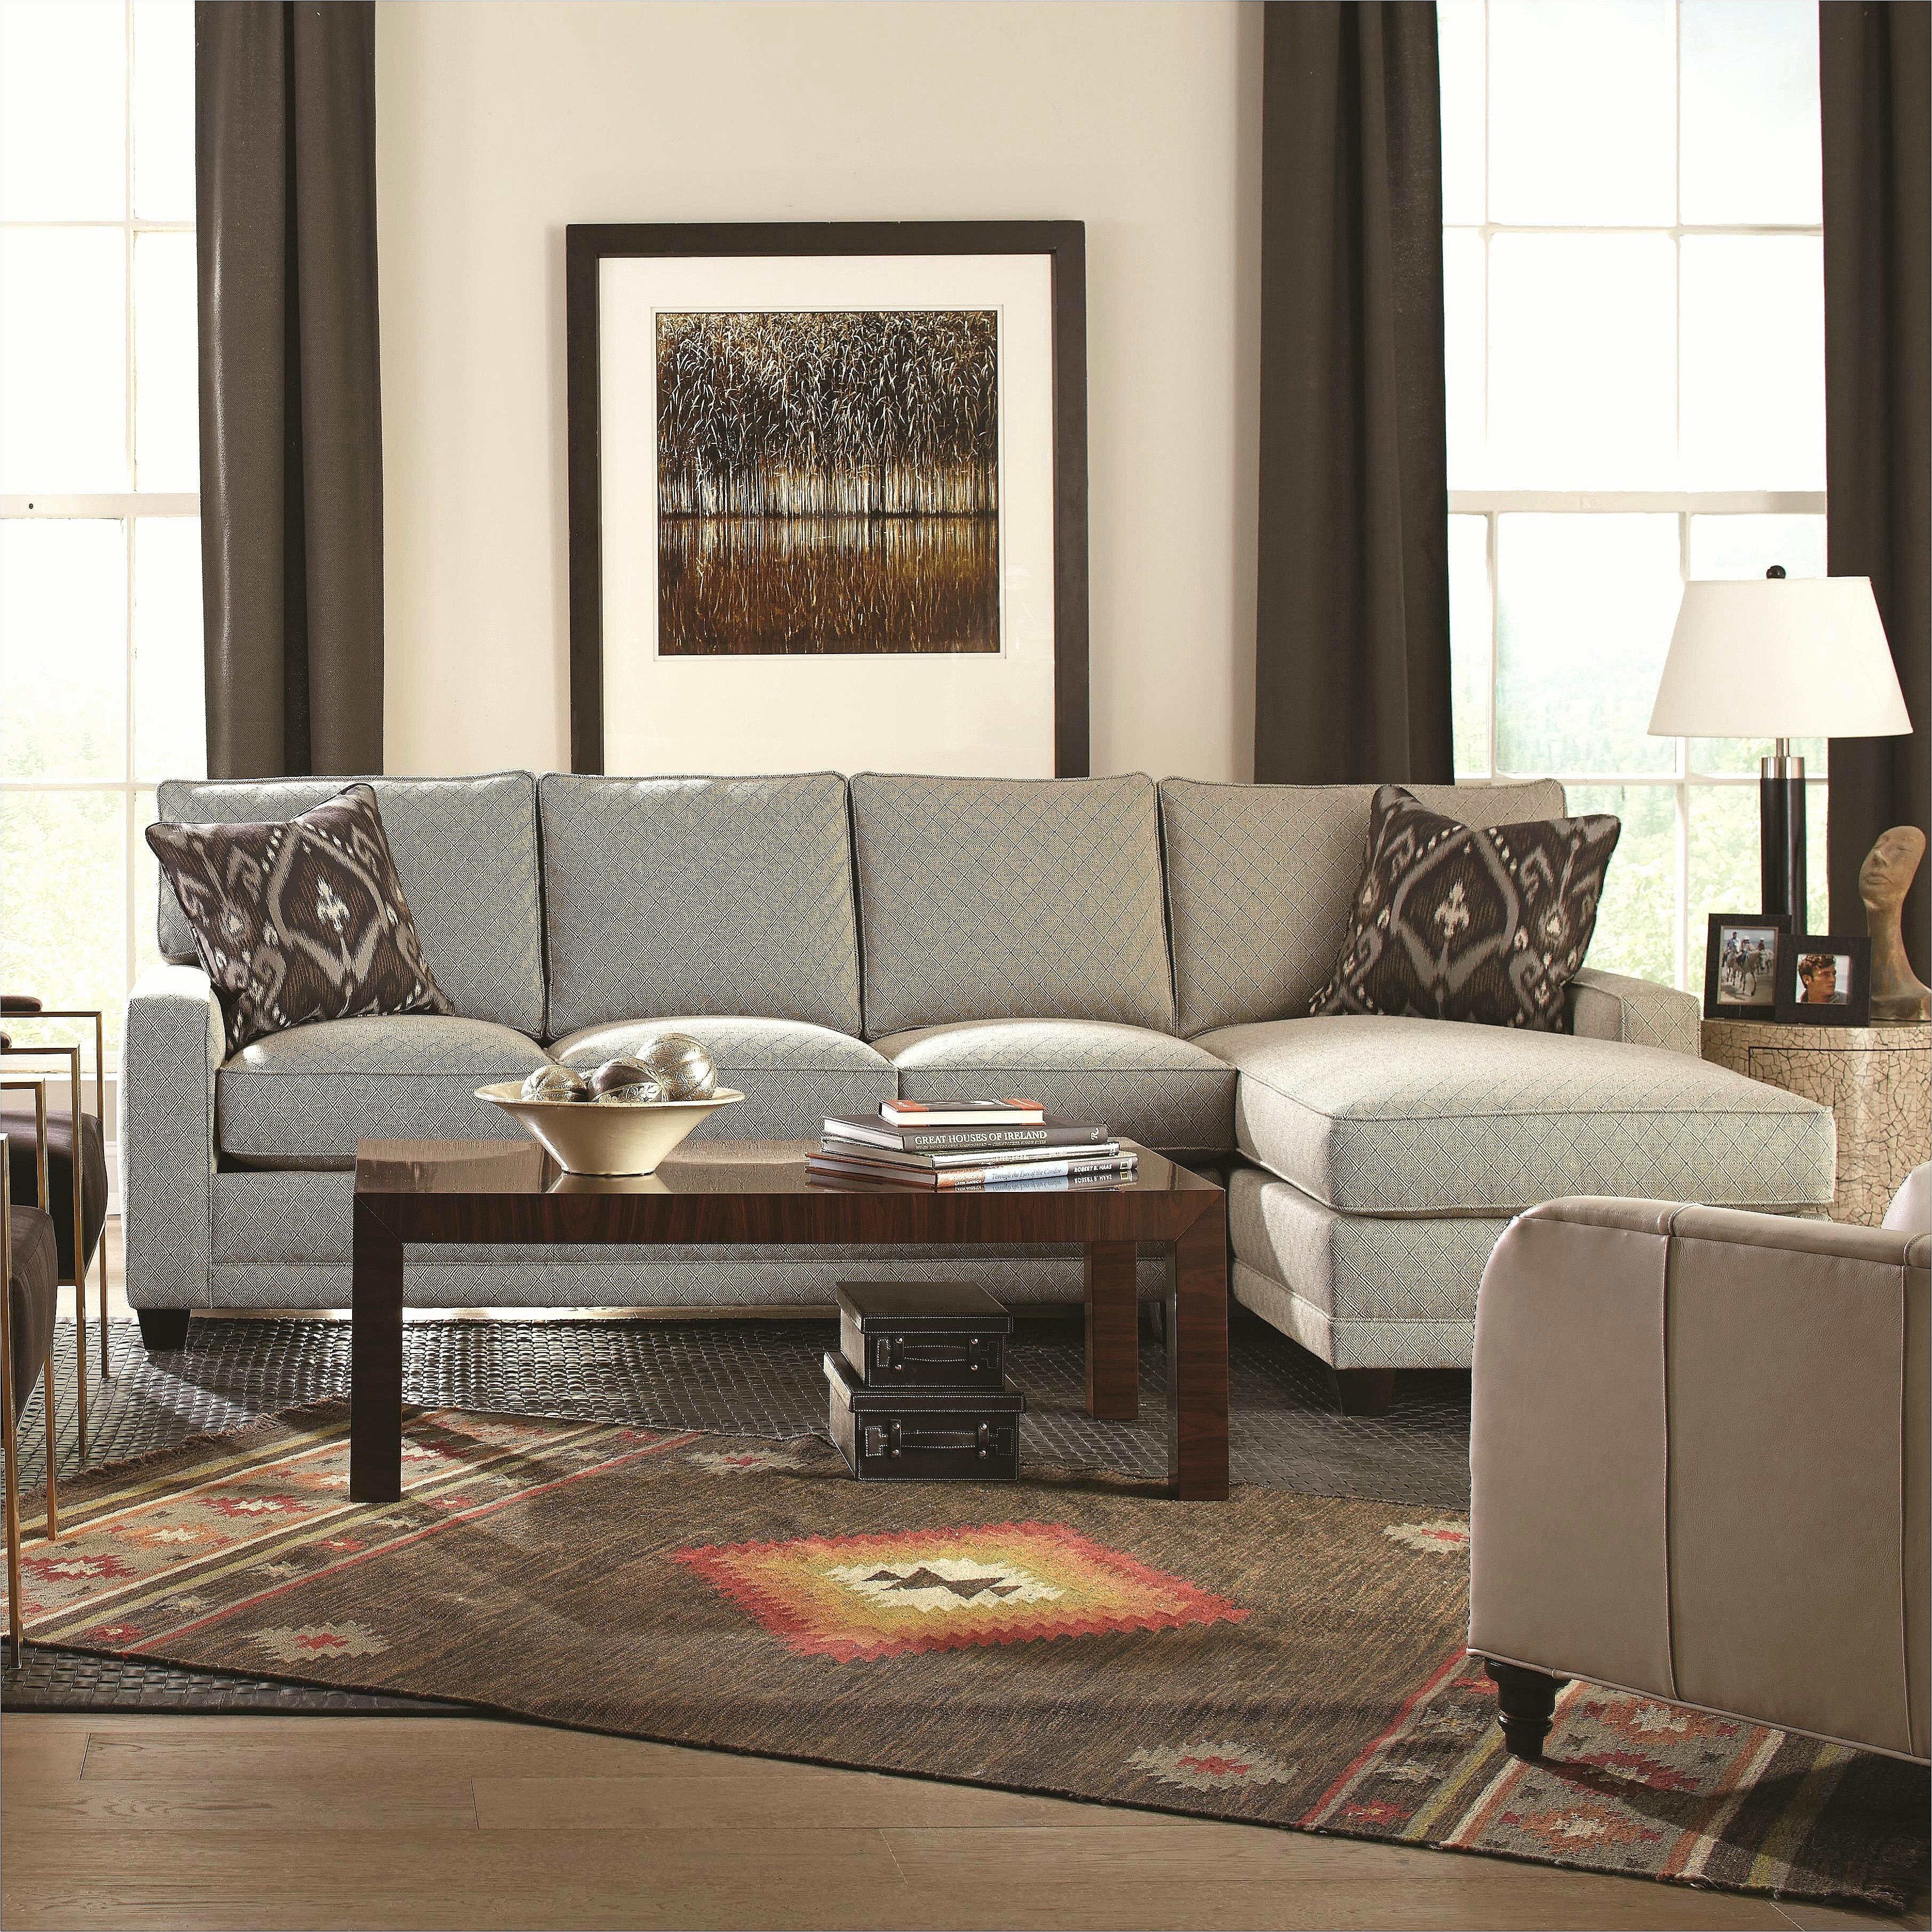 sofa designs fresh modern living room furniture new gunstige sofa macys furniture 0d